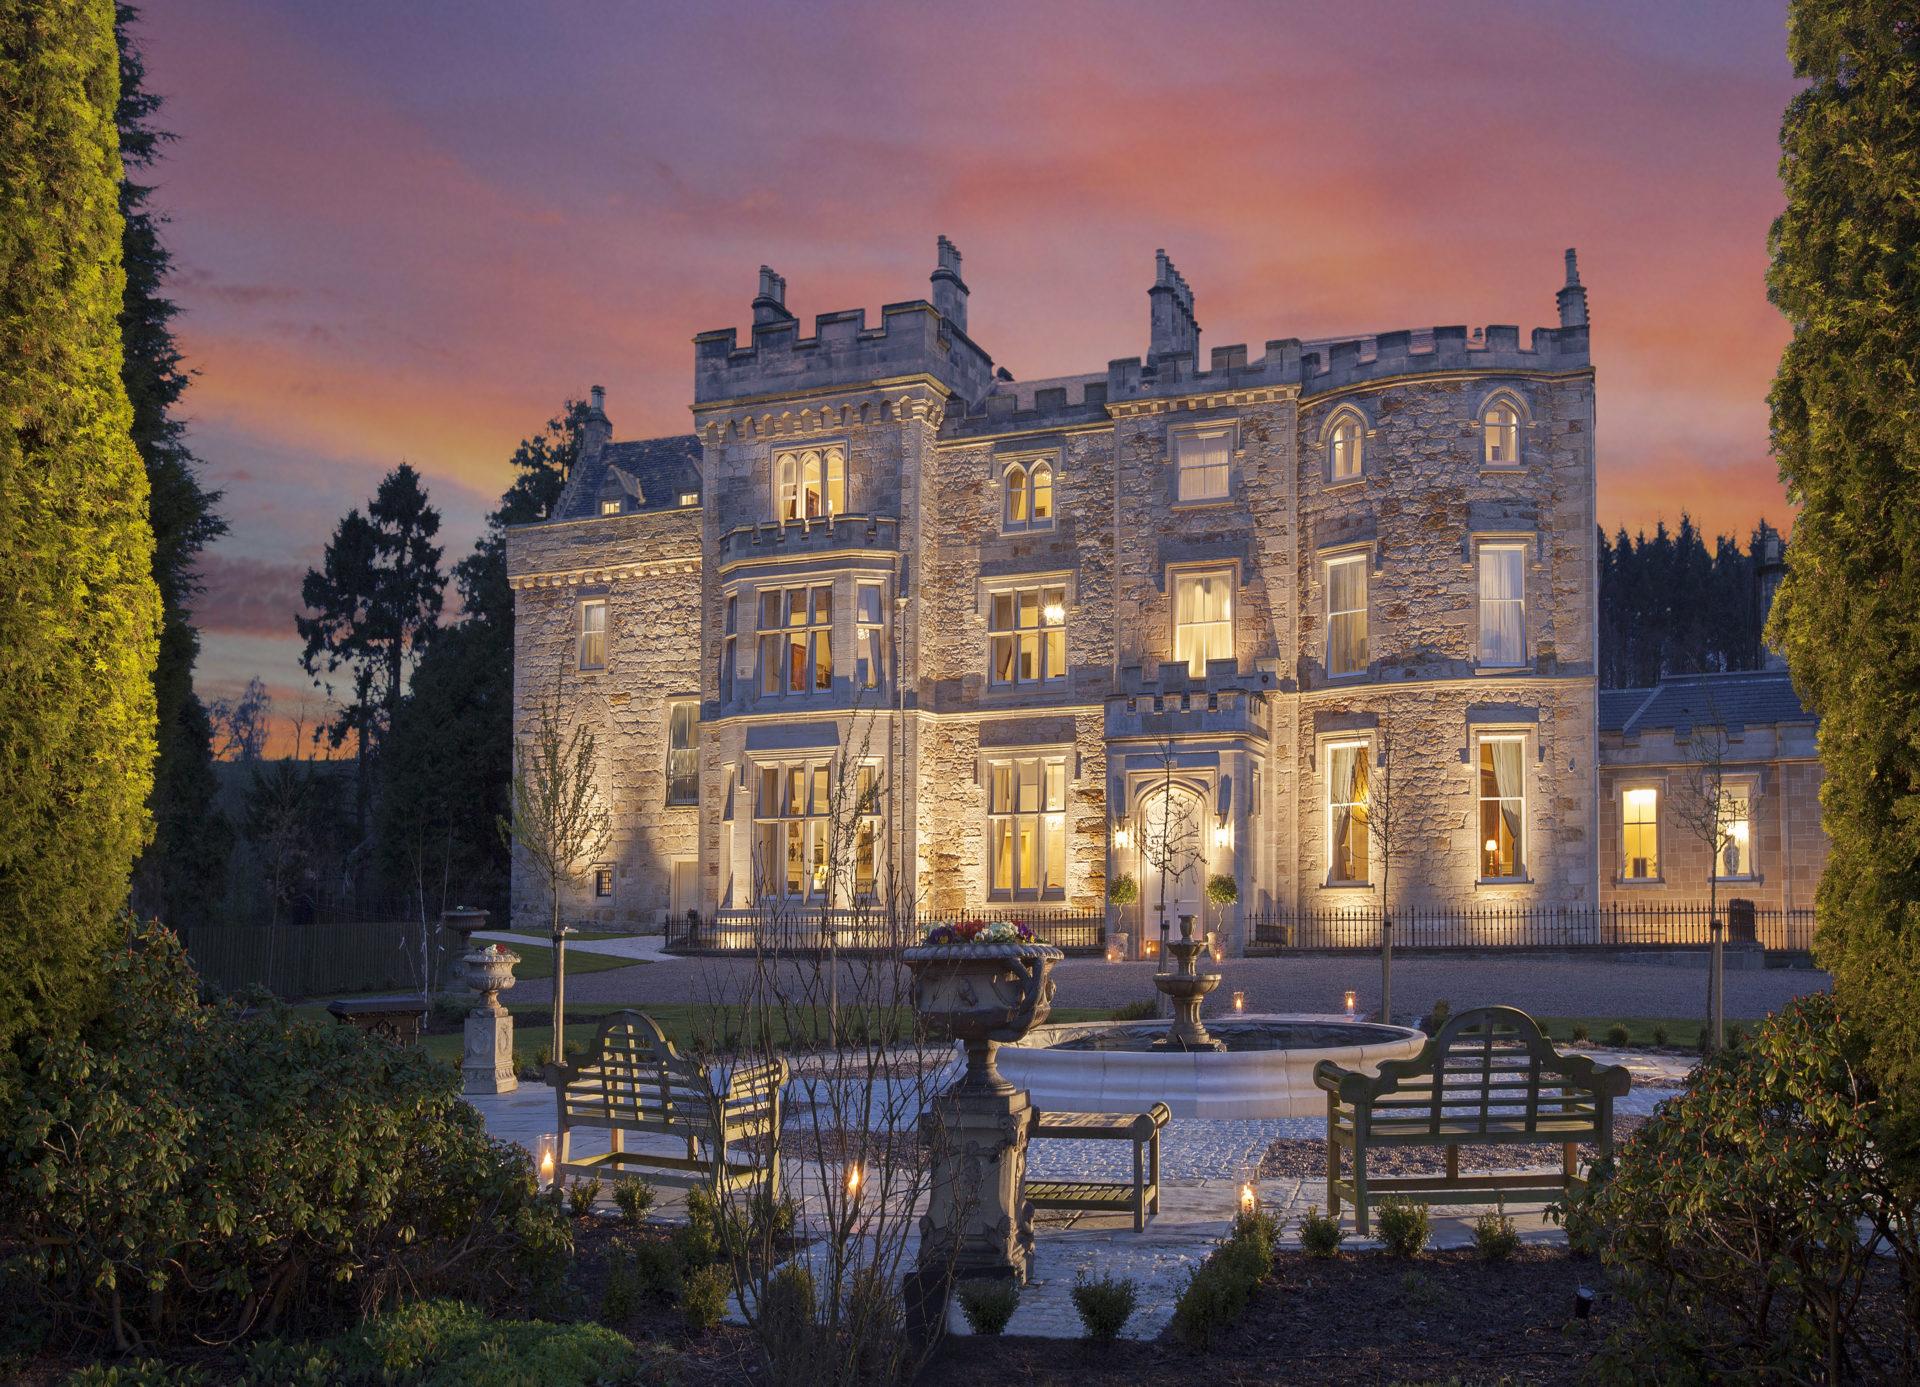 Schotland, Het mooiste land ter wereld 6-daagse luxe reis v.a. 990€ 2